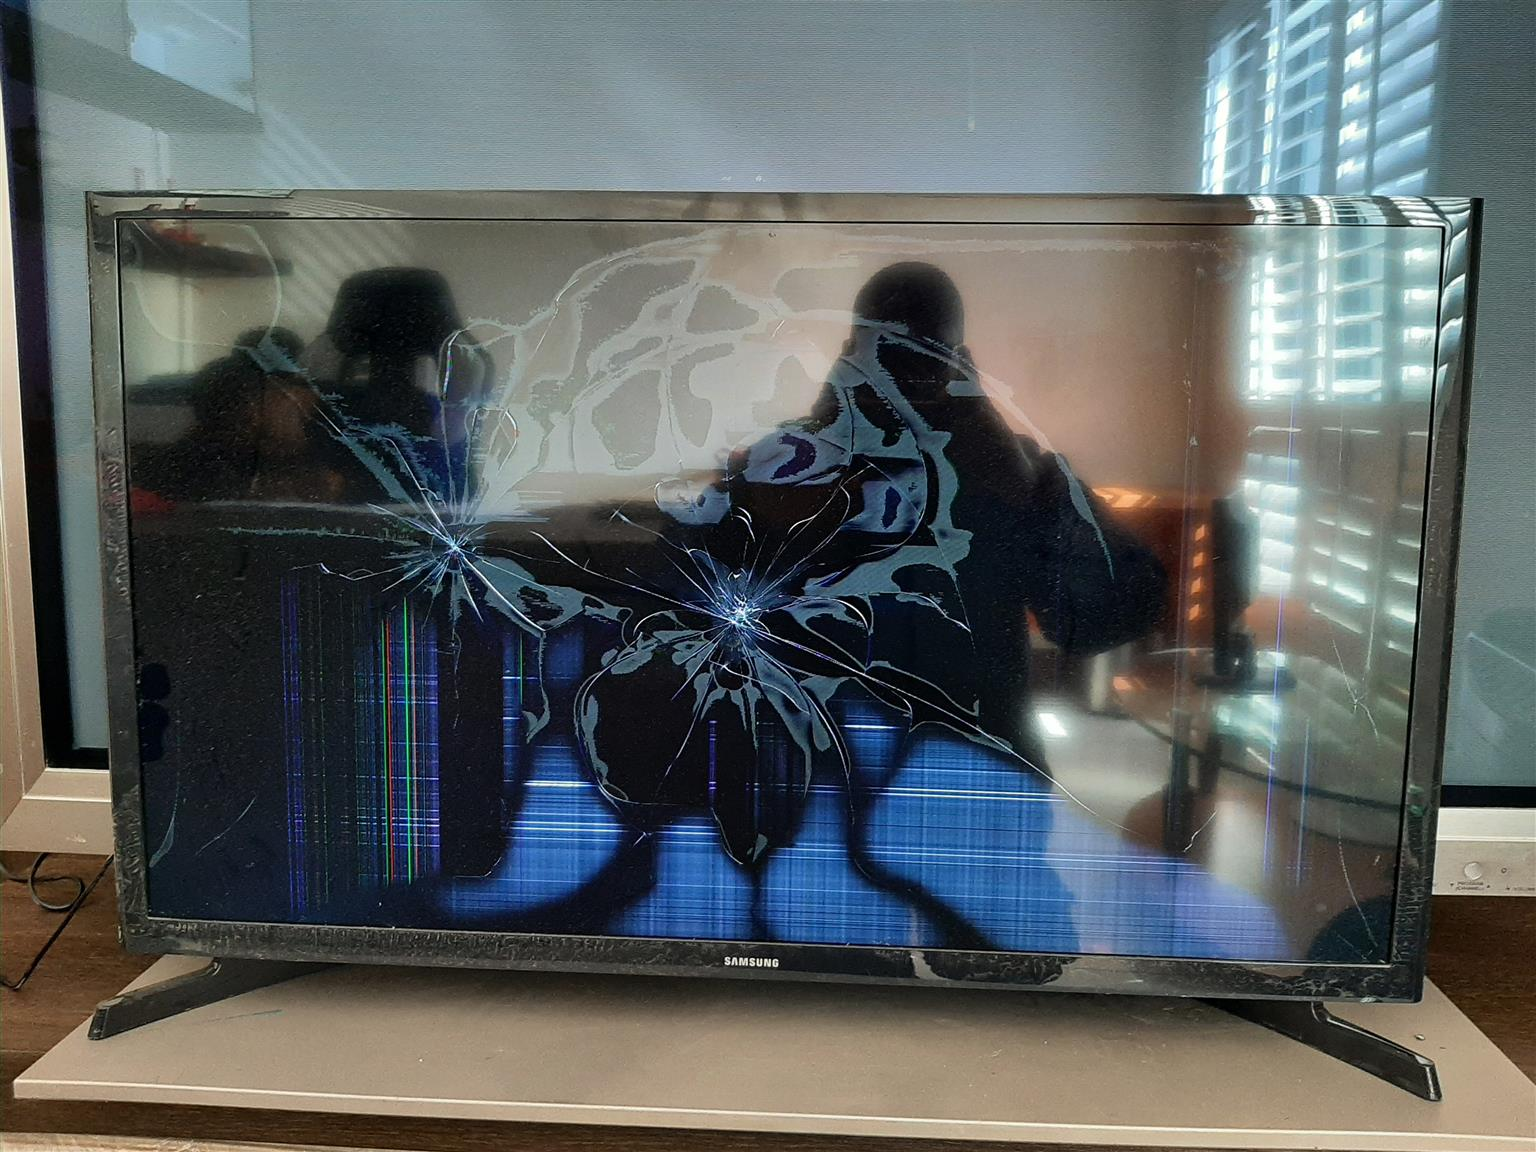 Samsung Flatscreen TV 32 inches (damaged screen)